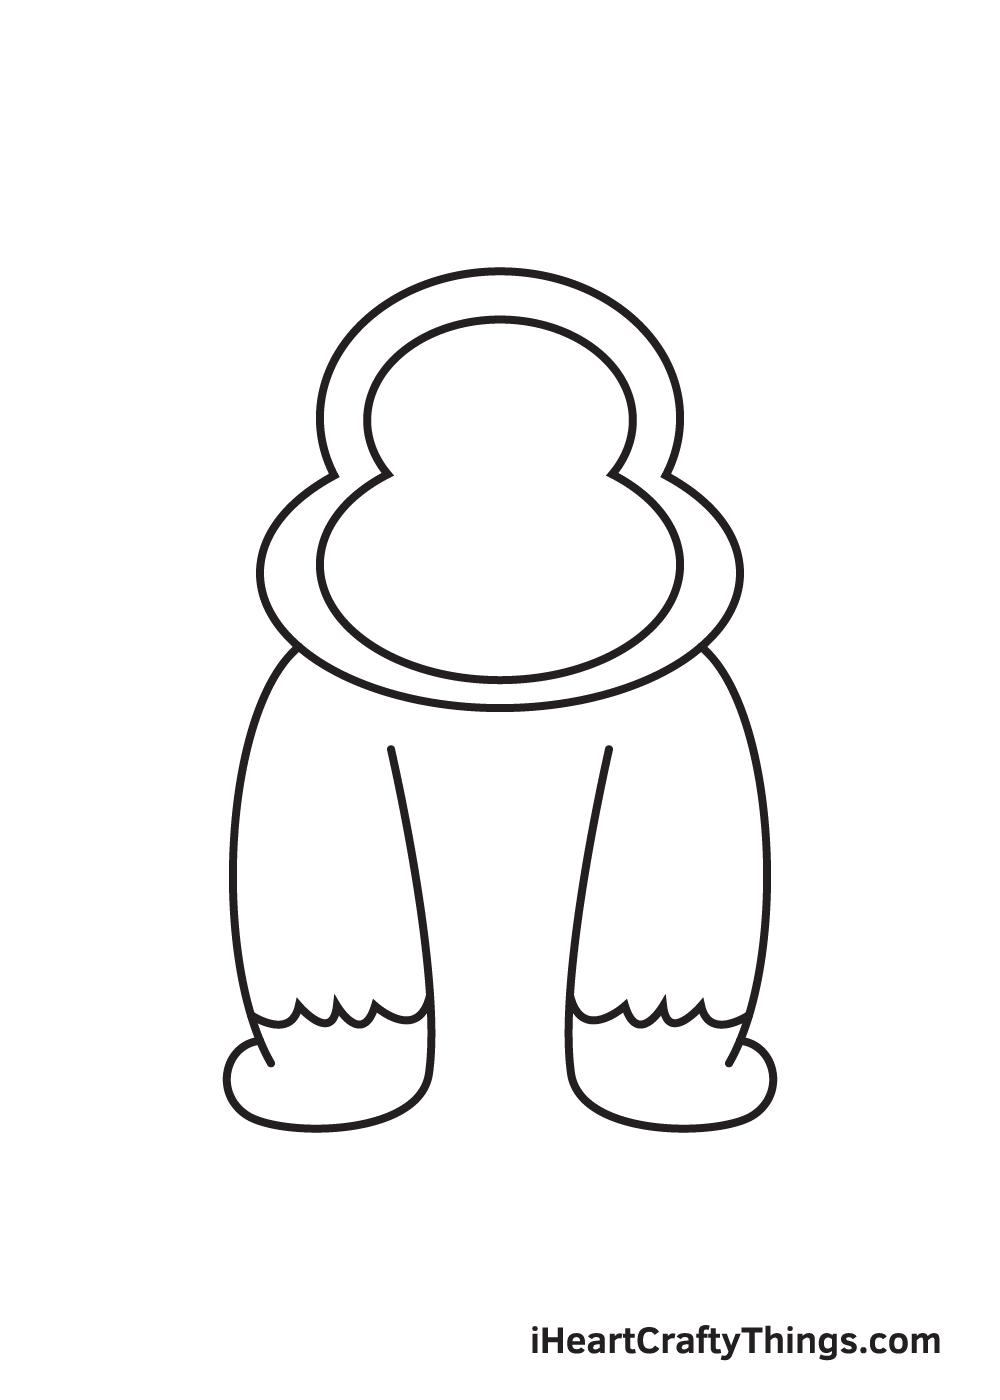 gorilla drawing - step 6